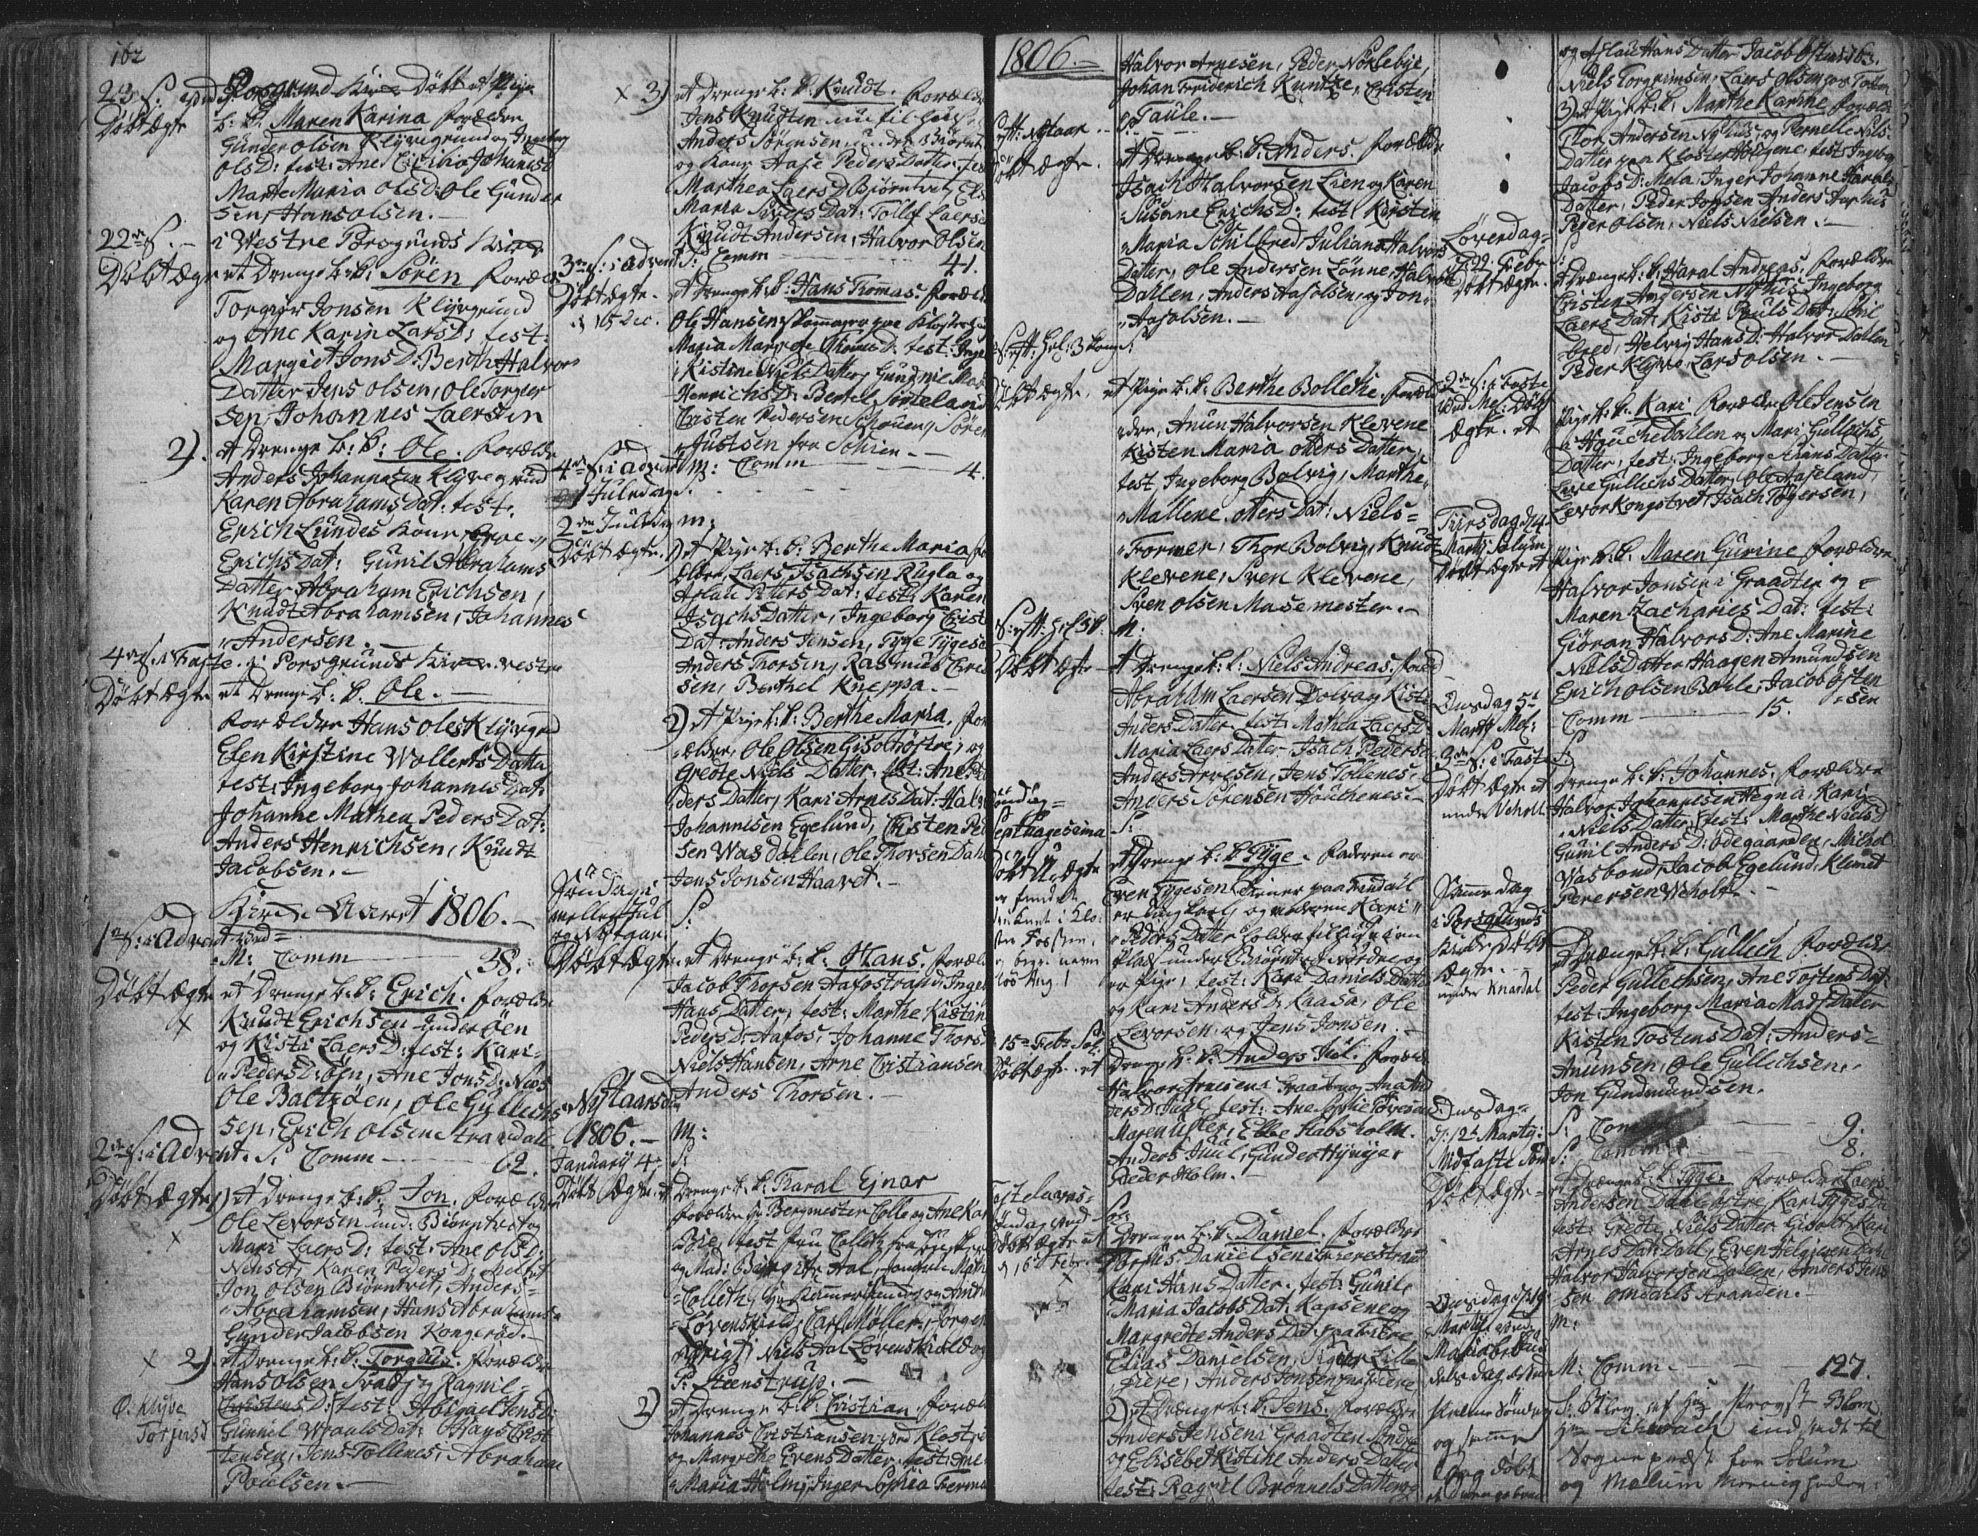 SAKO, Solum kirkebøker, F/Fa/L0003: Ministerialbok nr. I 3, 1761-1814, s. 162-163